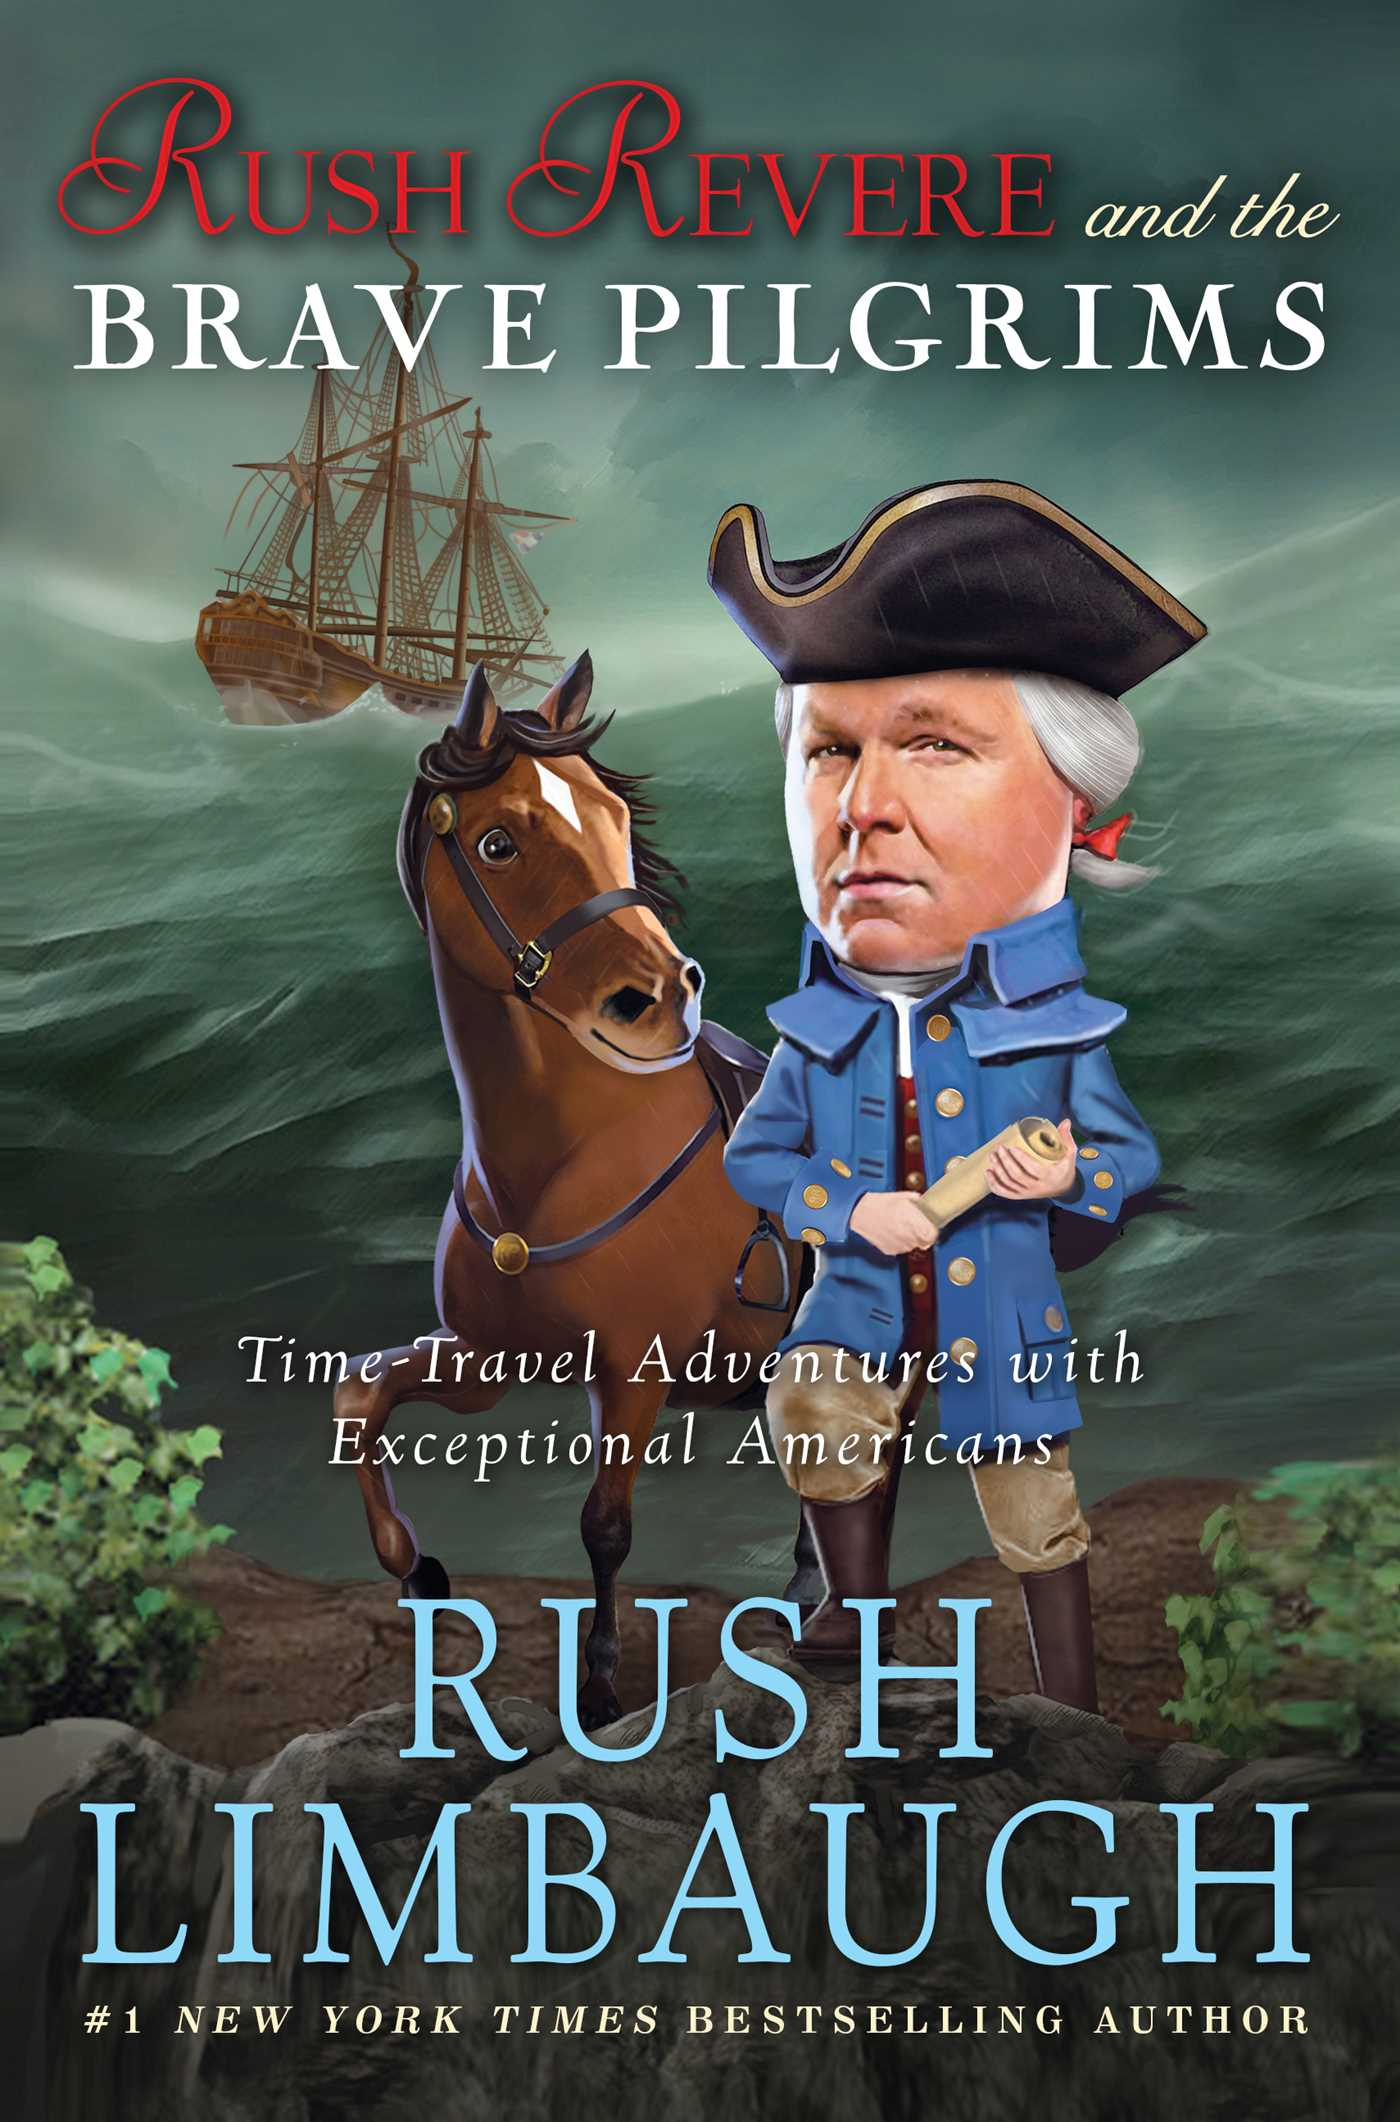 Rush revere and the brave pilgrims 9781476755915 hr